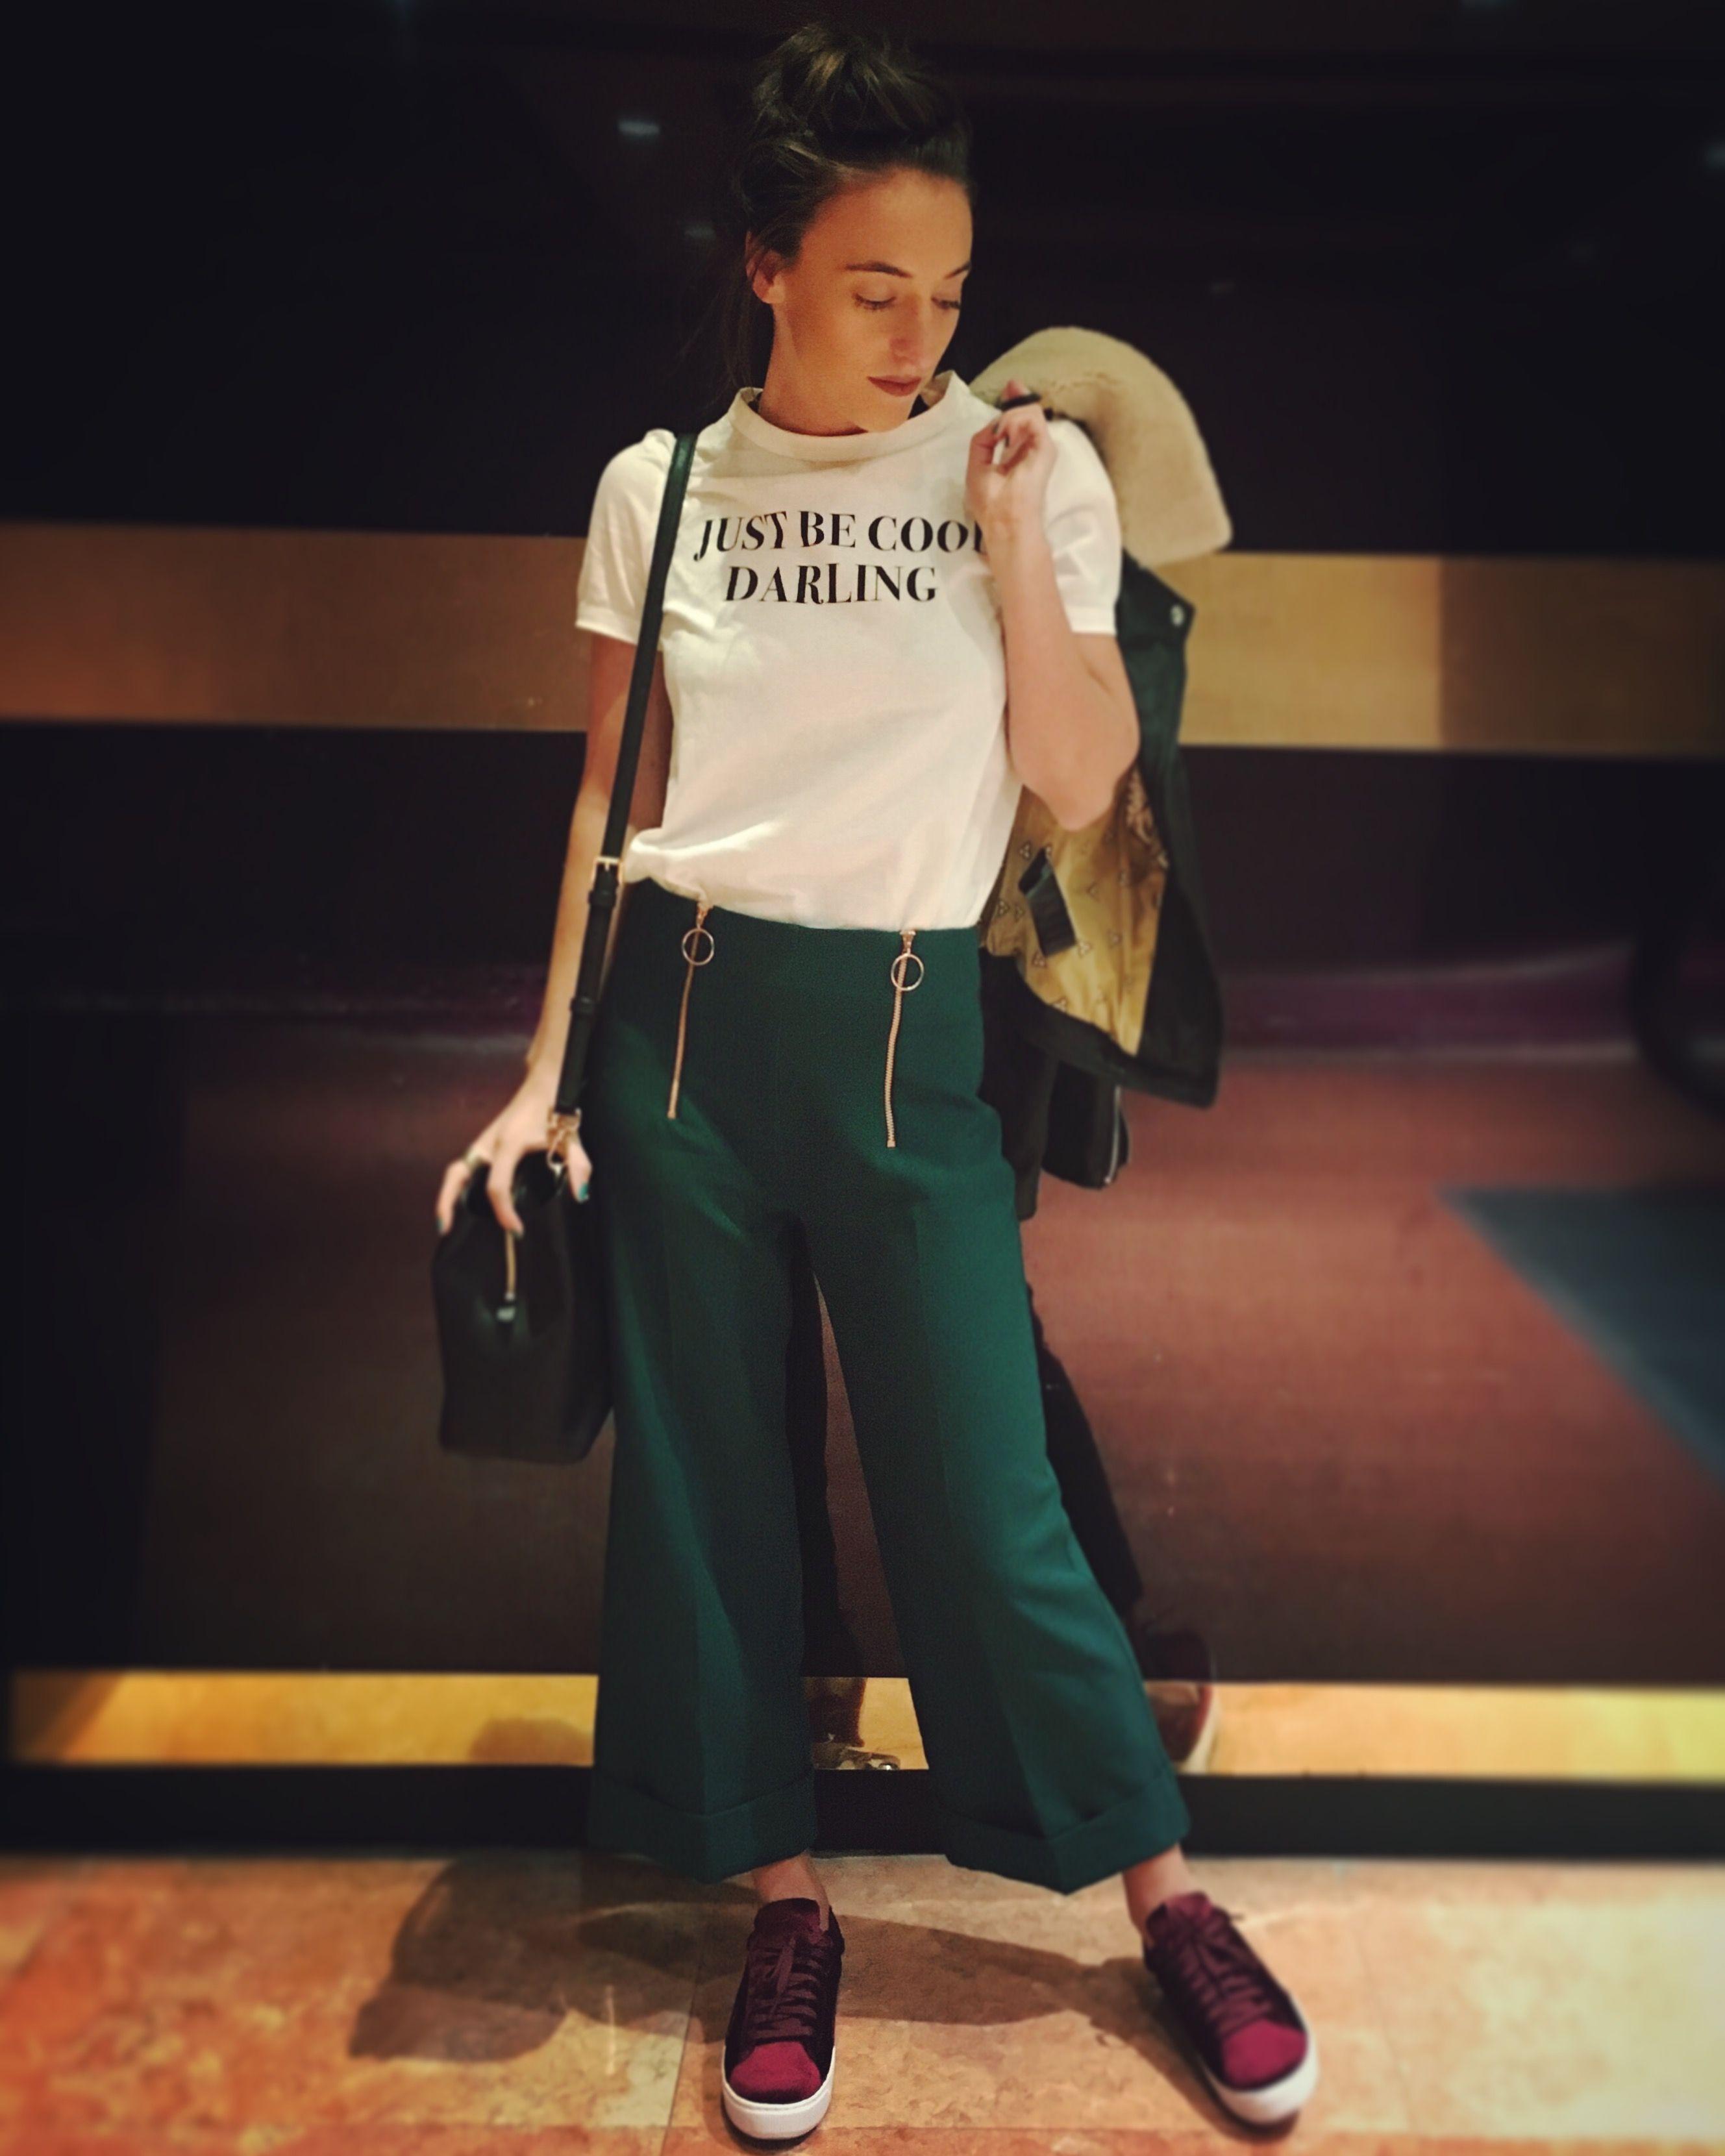 96a8197c12b2e Just Be Cool Darling Zara T-Shirt